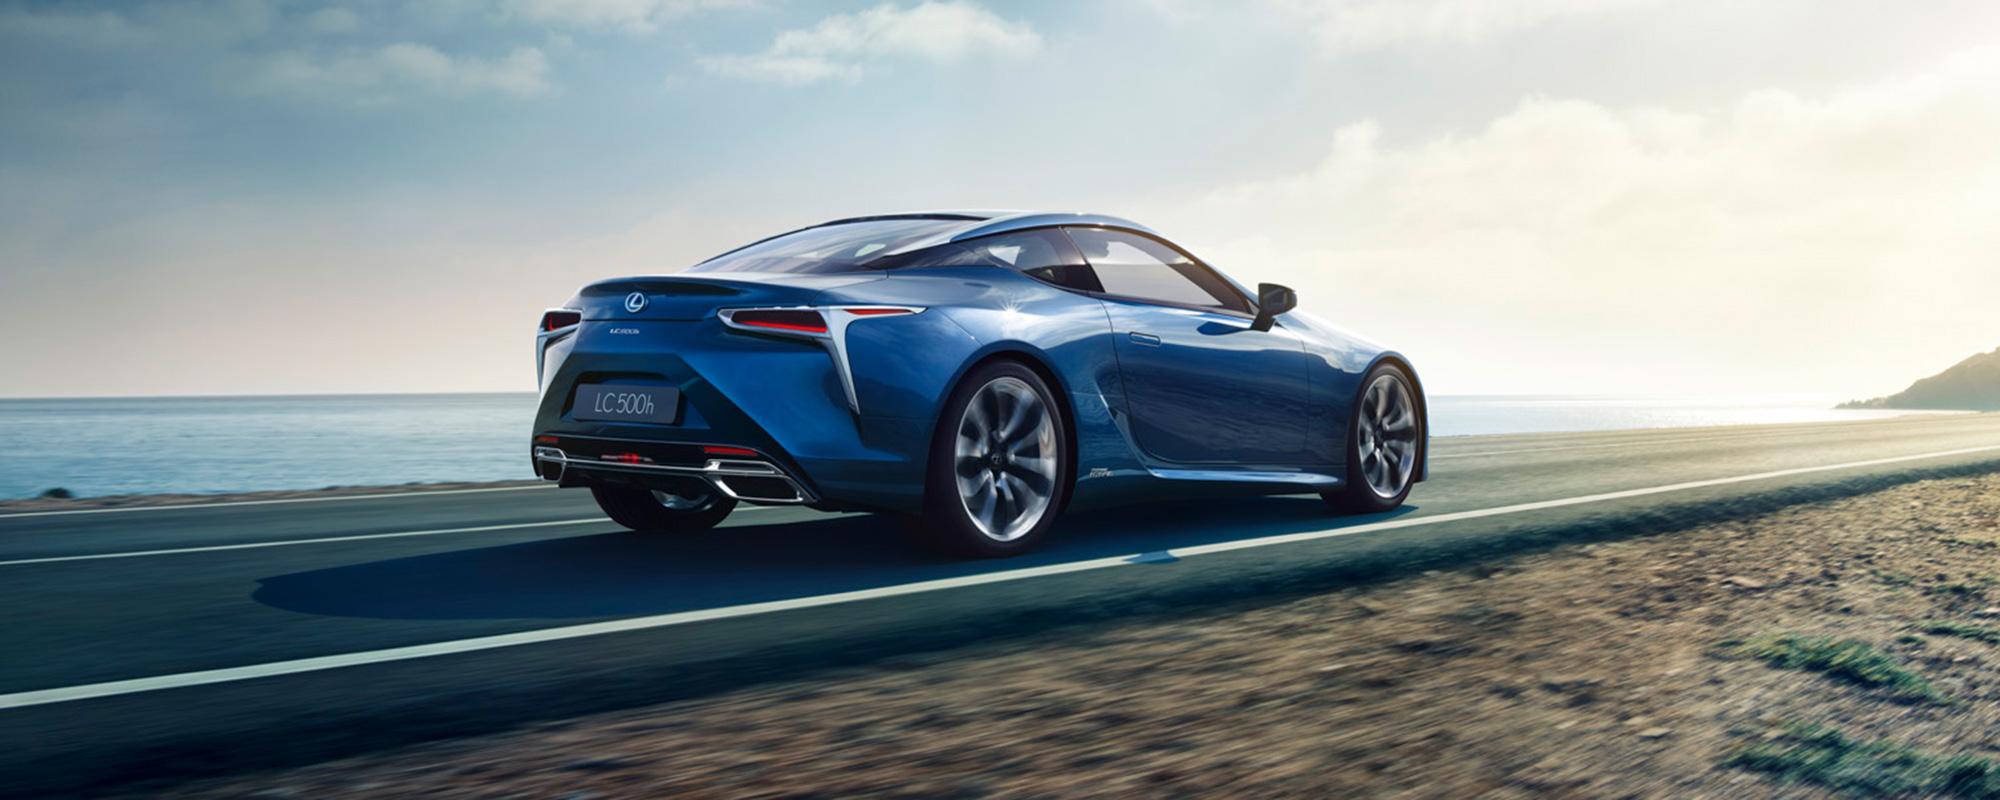 Bloedstollende Hybrid Gran Turismo; de Lexus LC 500[h]